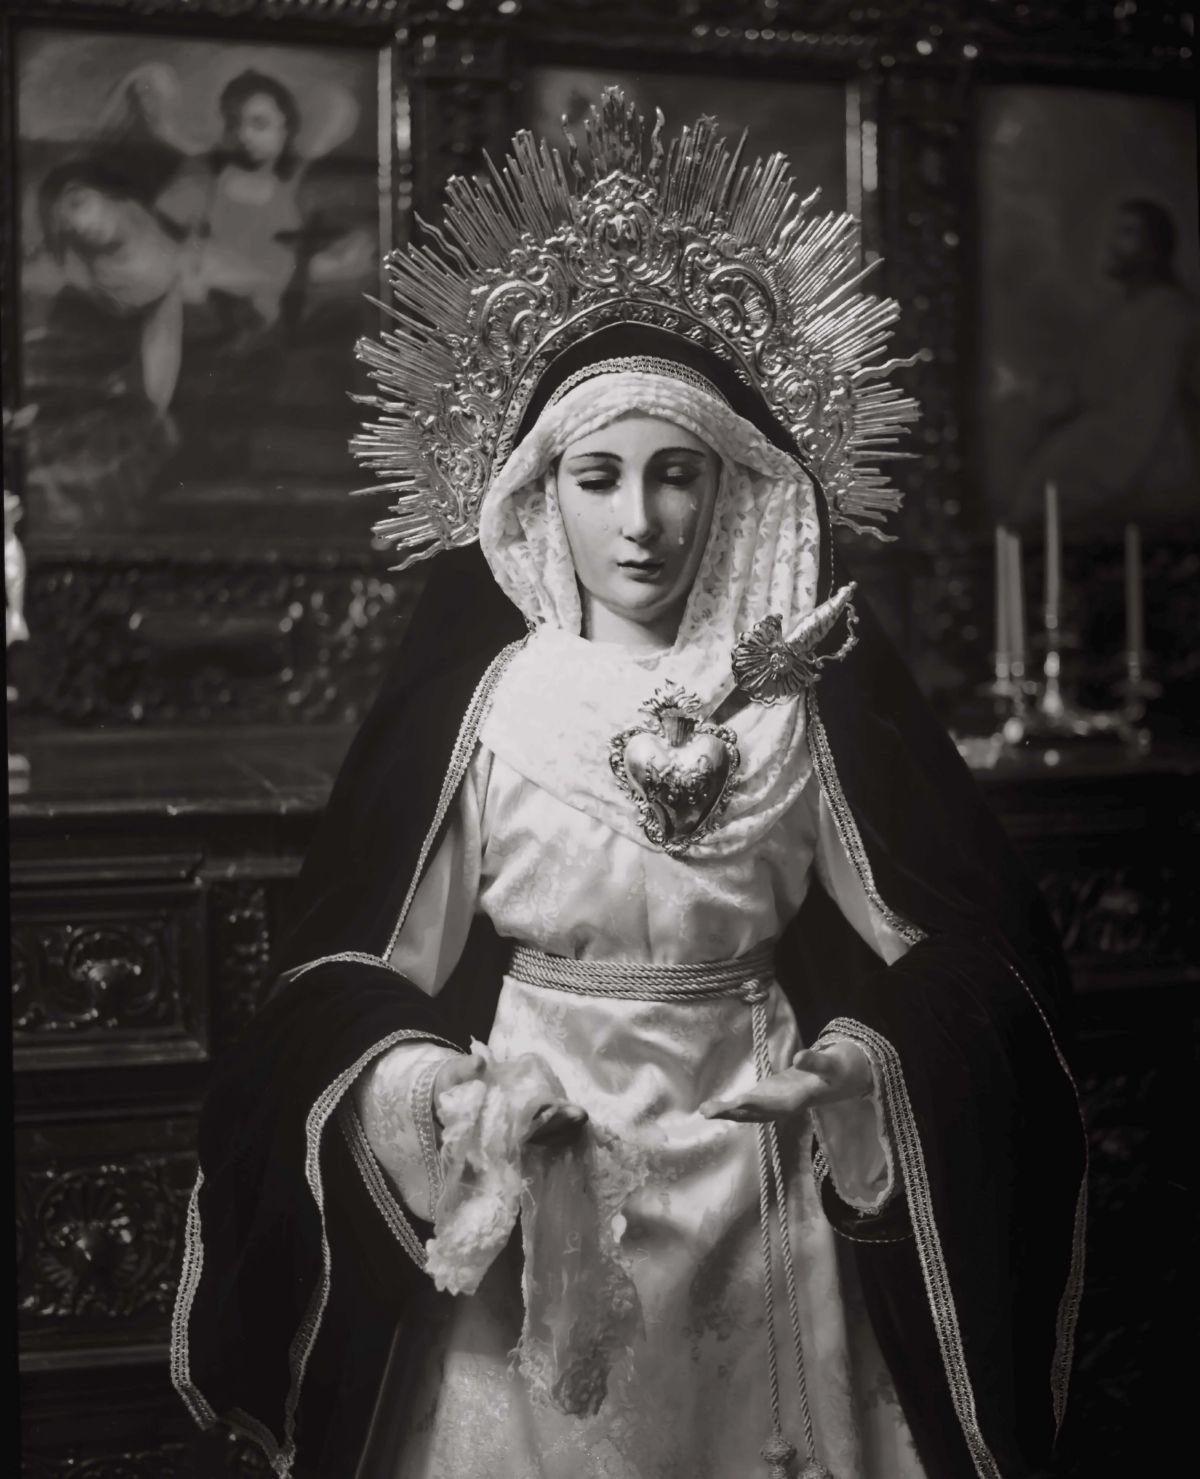 Virgin of the pains in San Marcelo church artwork by Juan Borja - art listed for sale on Artplode